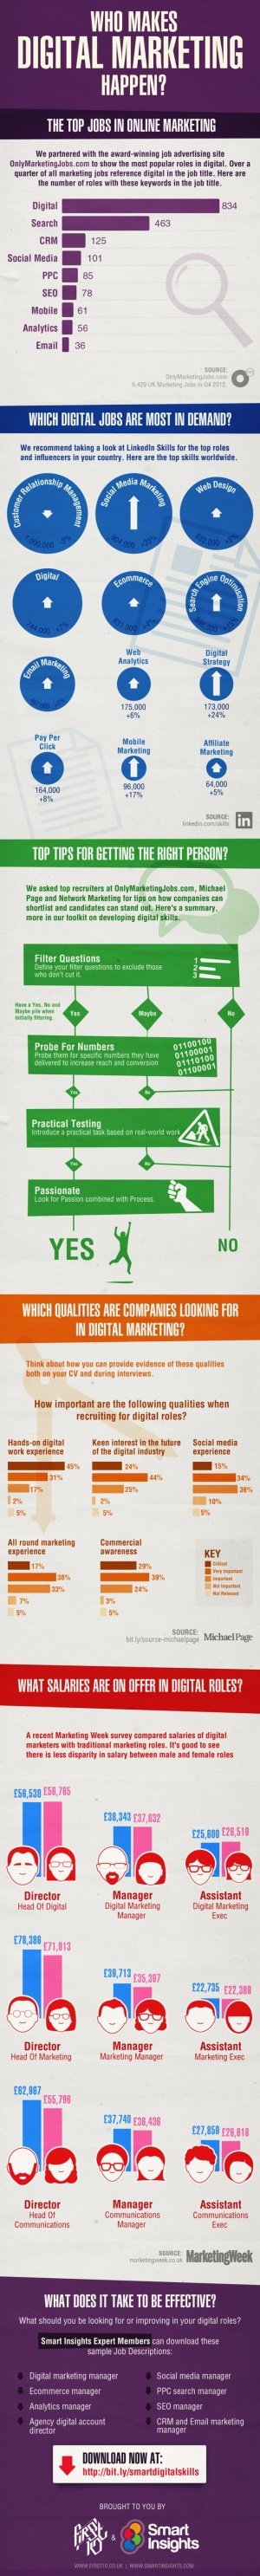 Who makes digital marketing happen?